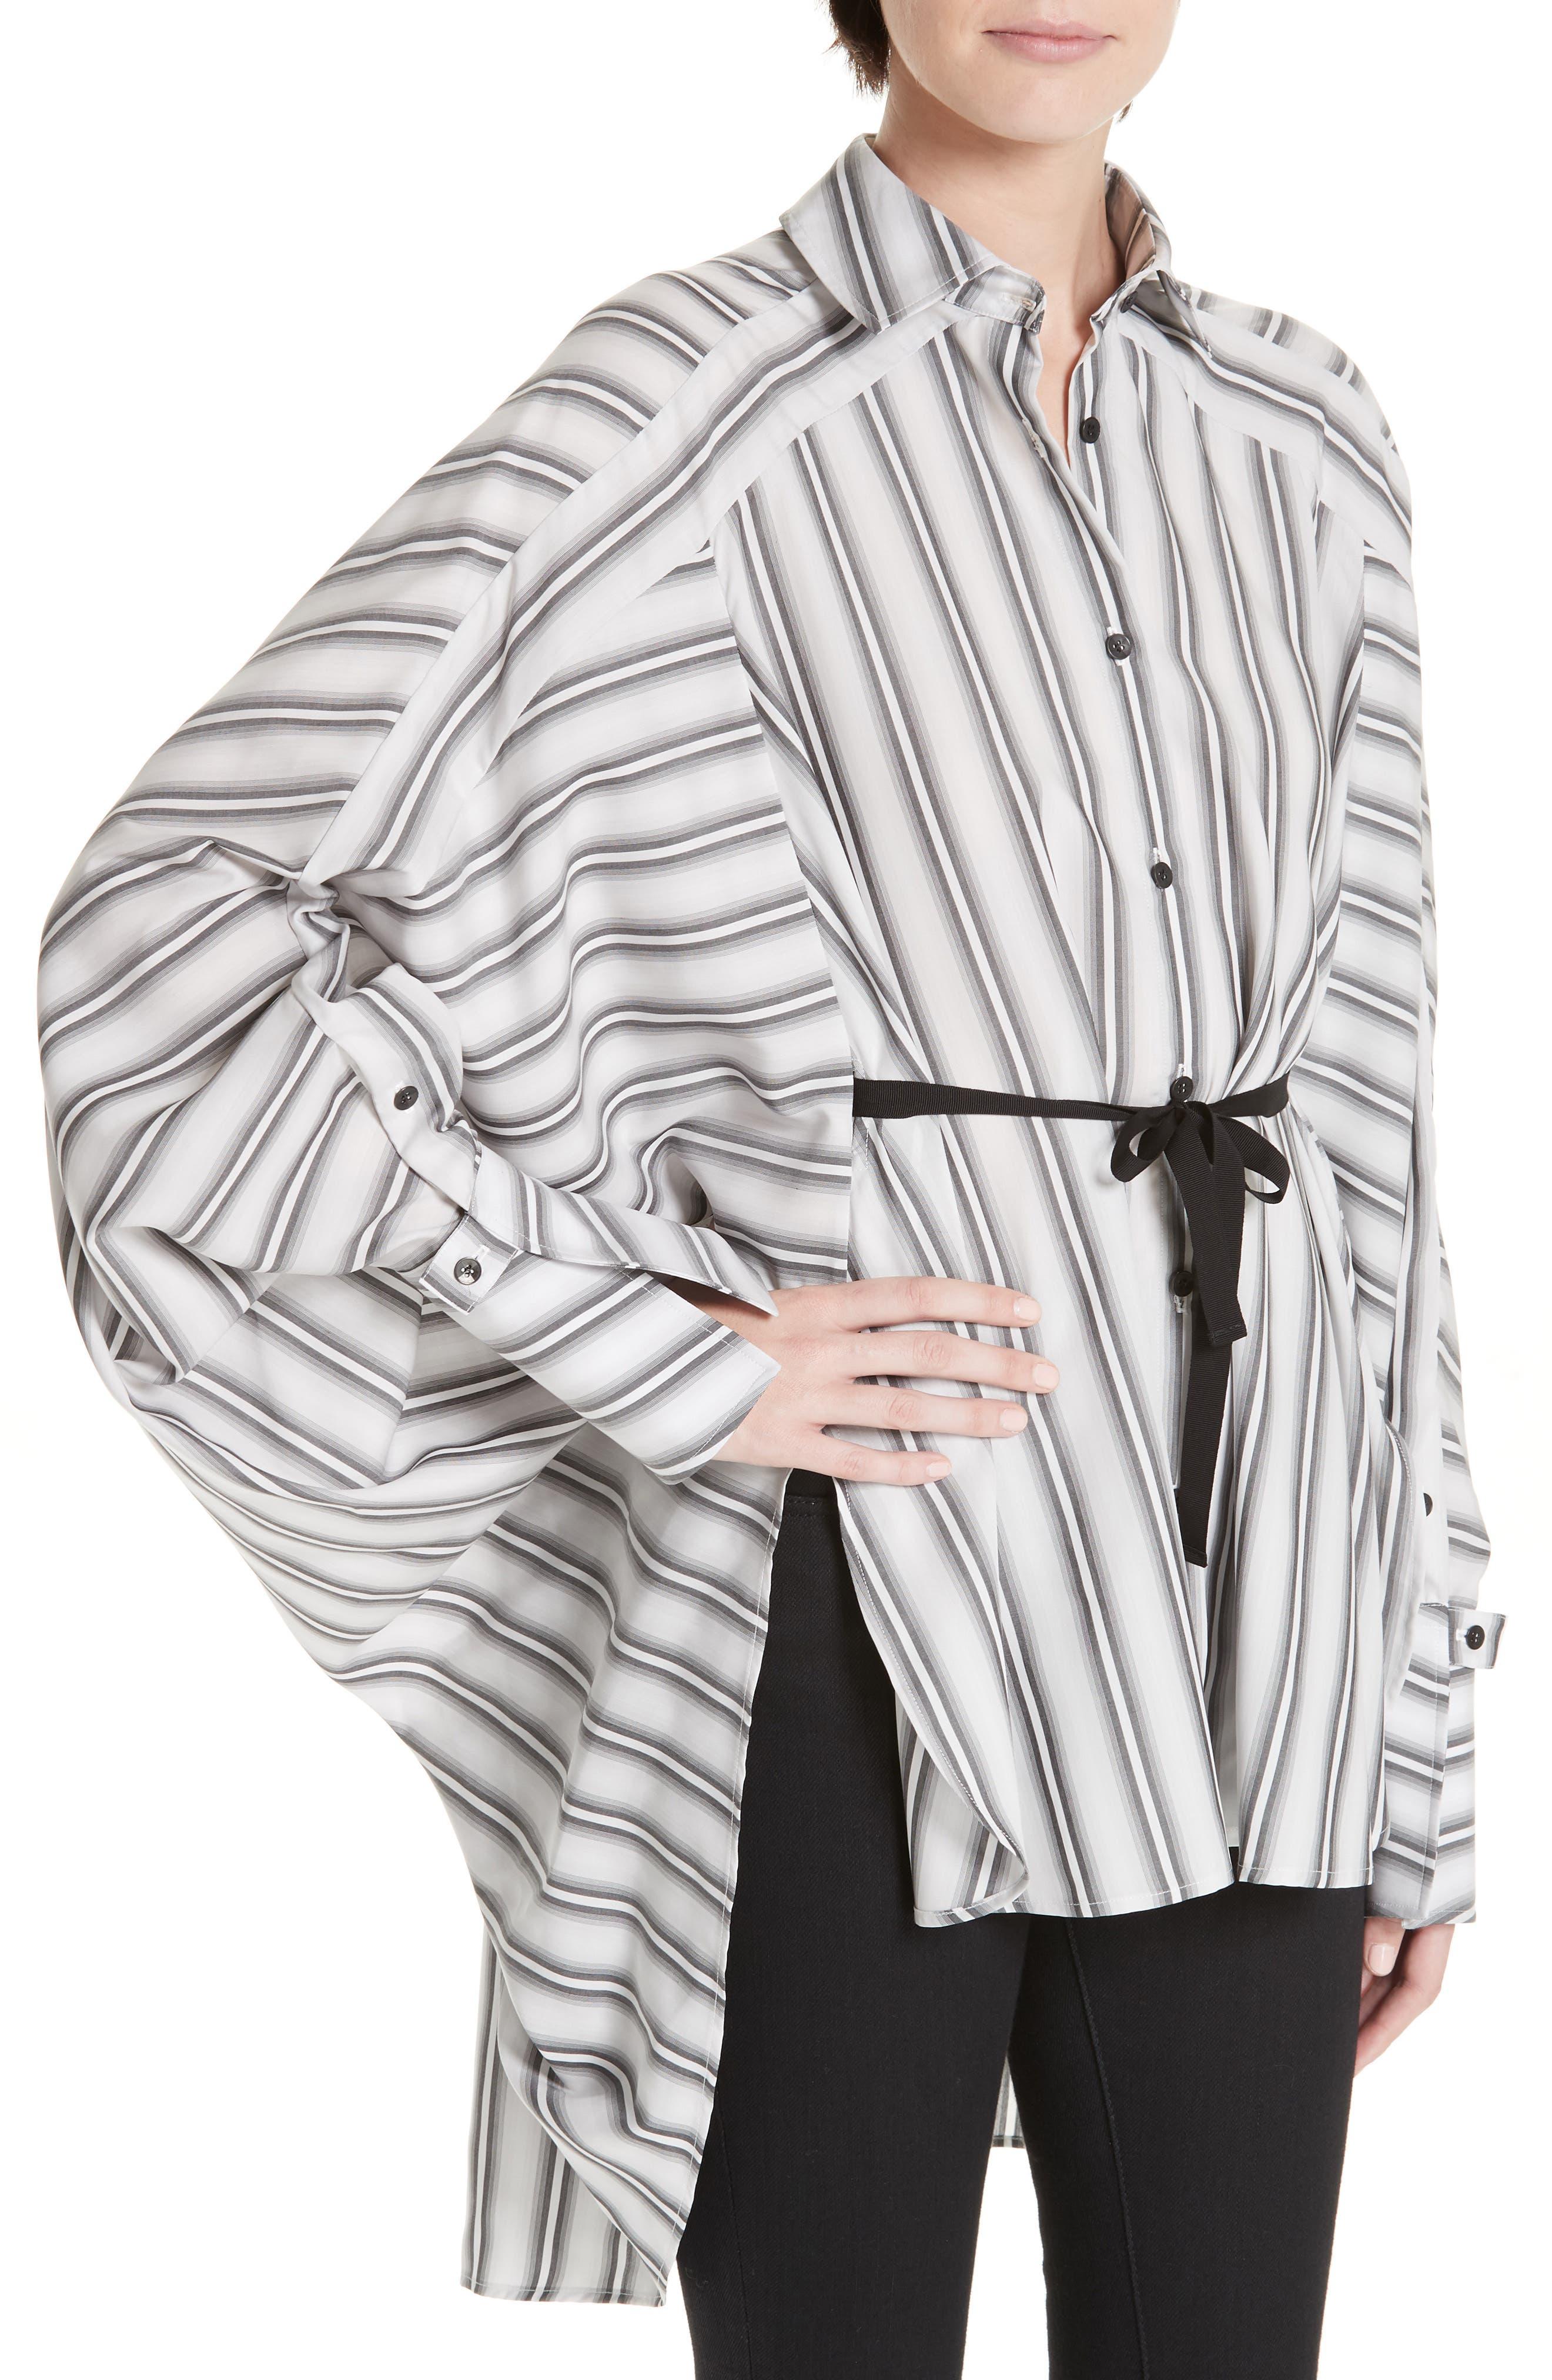 PALMER/HARDING, Streep Stripe Shirt, Alternate thumbnail 4, color, GRADIENT STRIPE WITH BLACK